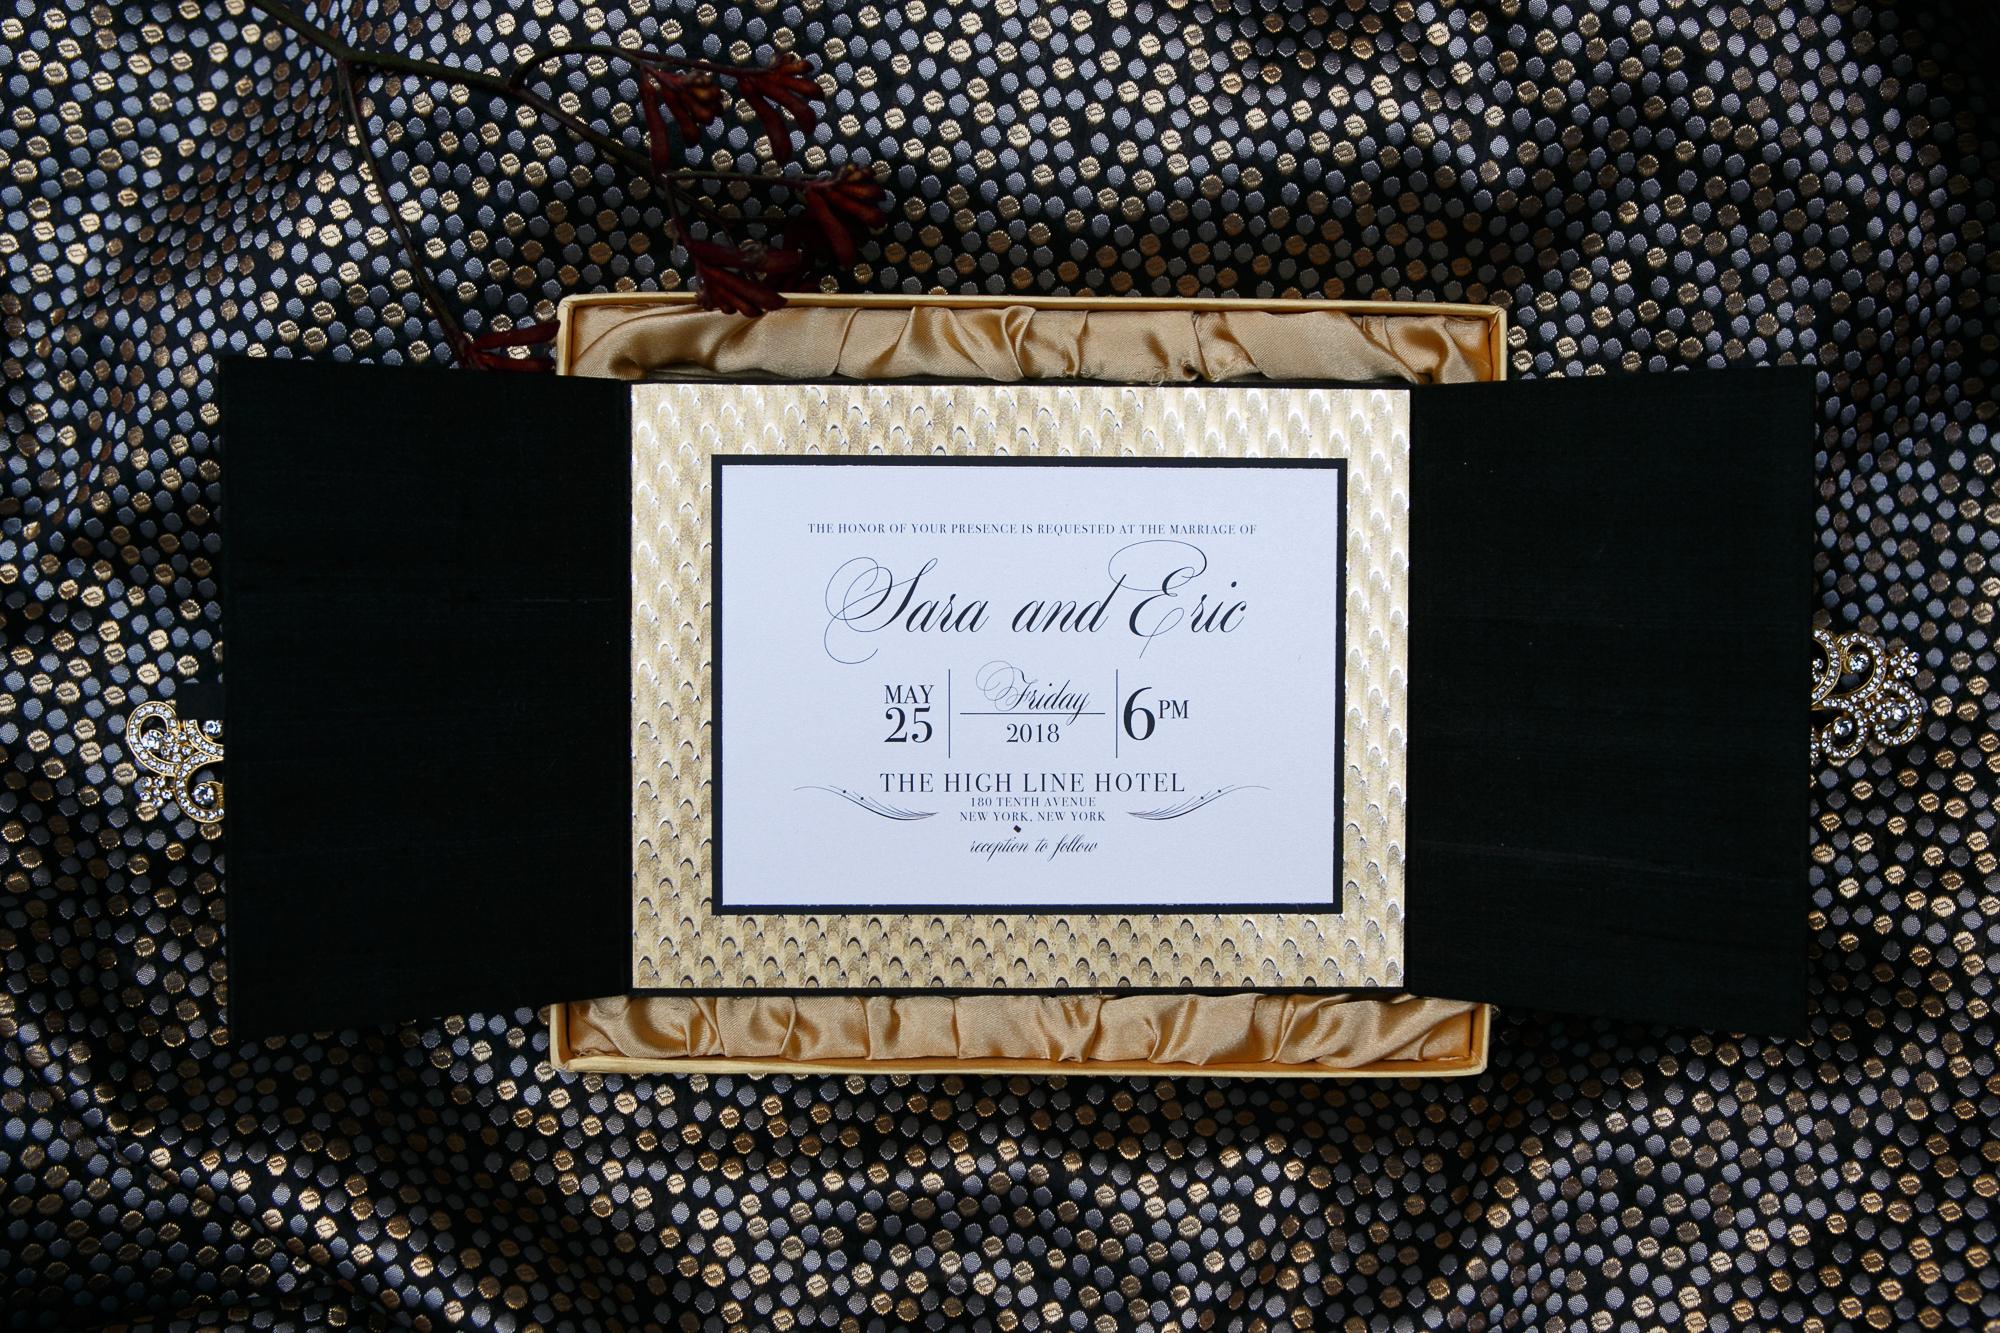 12 Black Satin Gold Foil Box Invitation Wedding Design Aribella Events.jpg